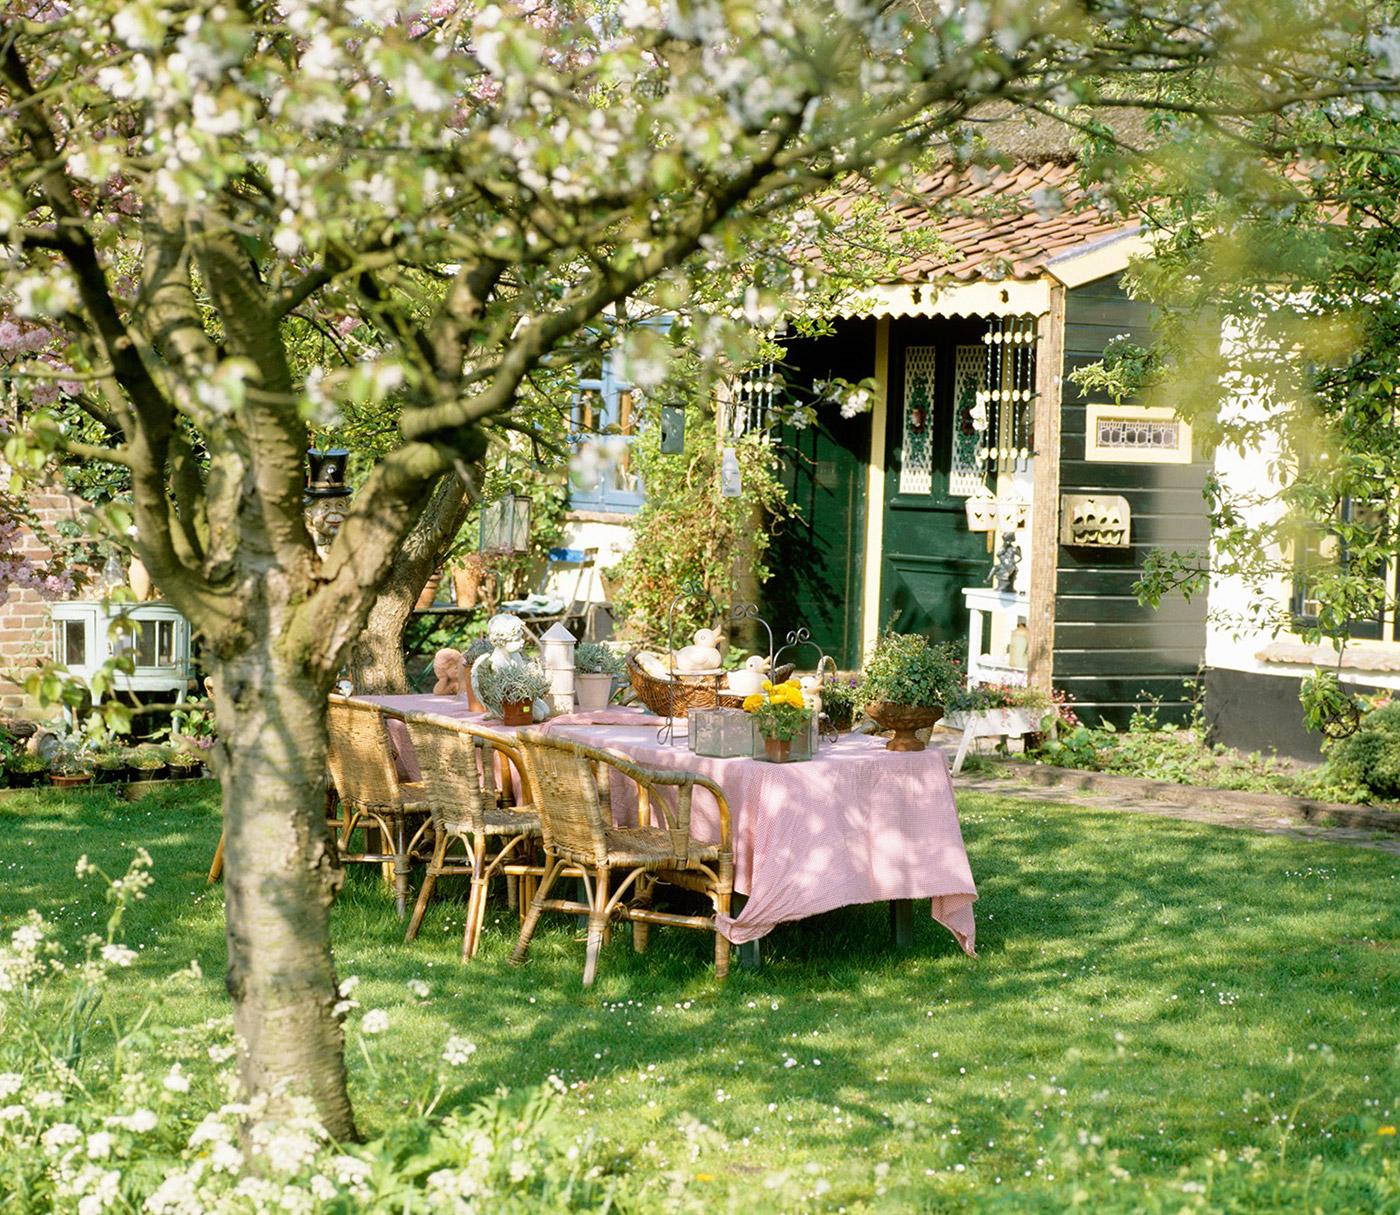 Diletta Amenta, Cottage, Ispirazione, Estate, Fiori, Mise en place